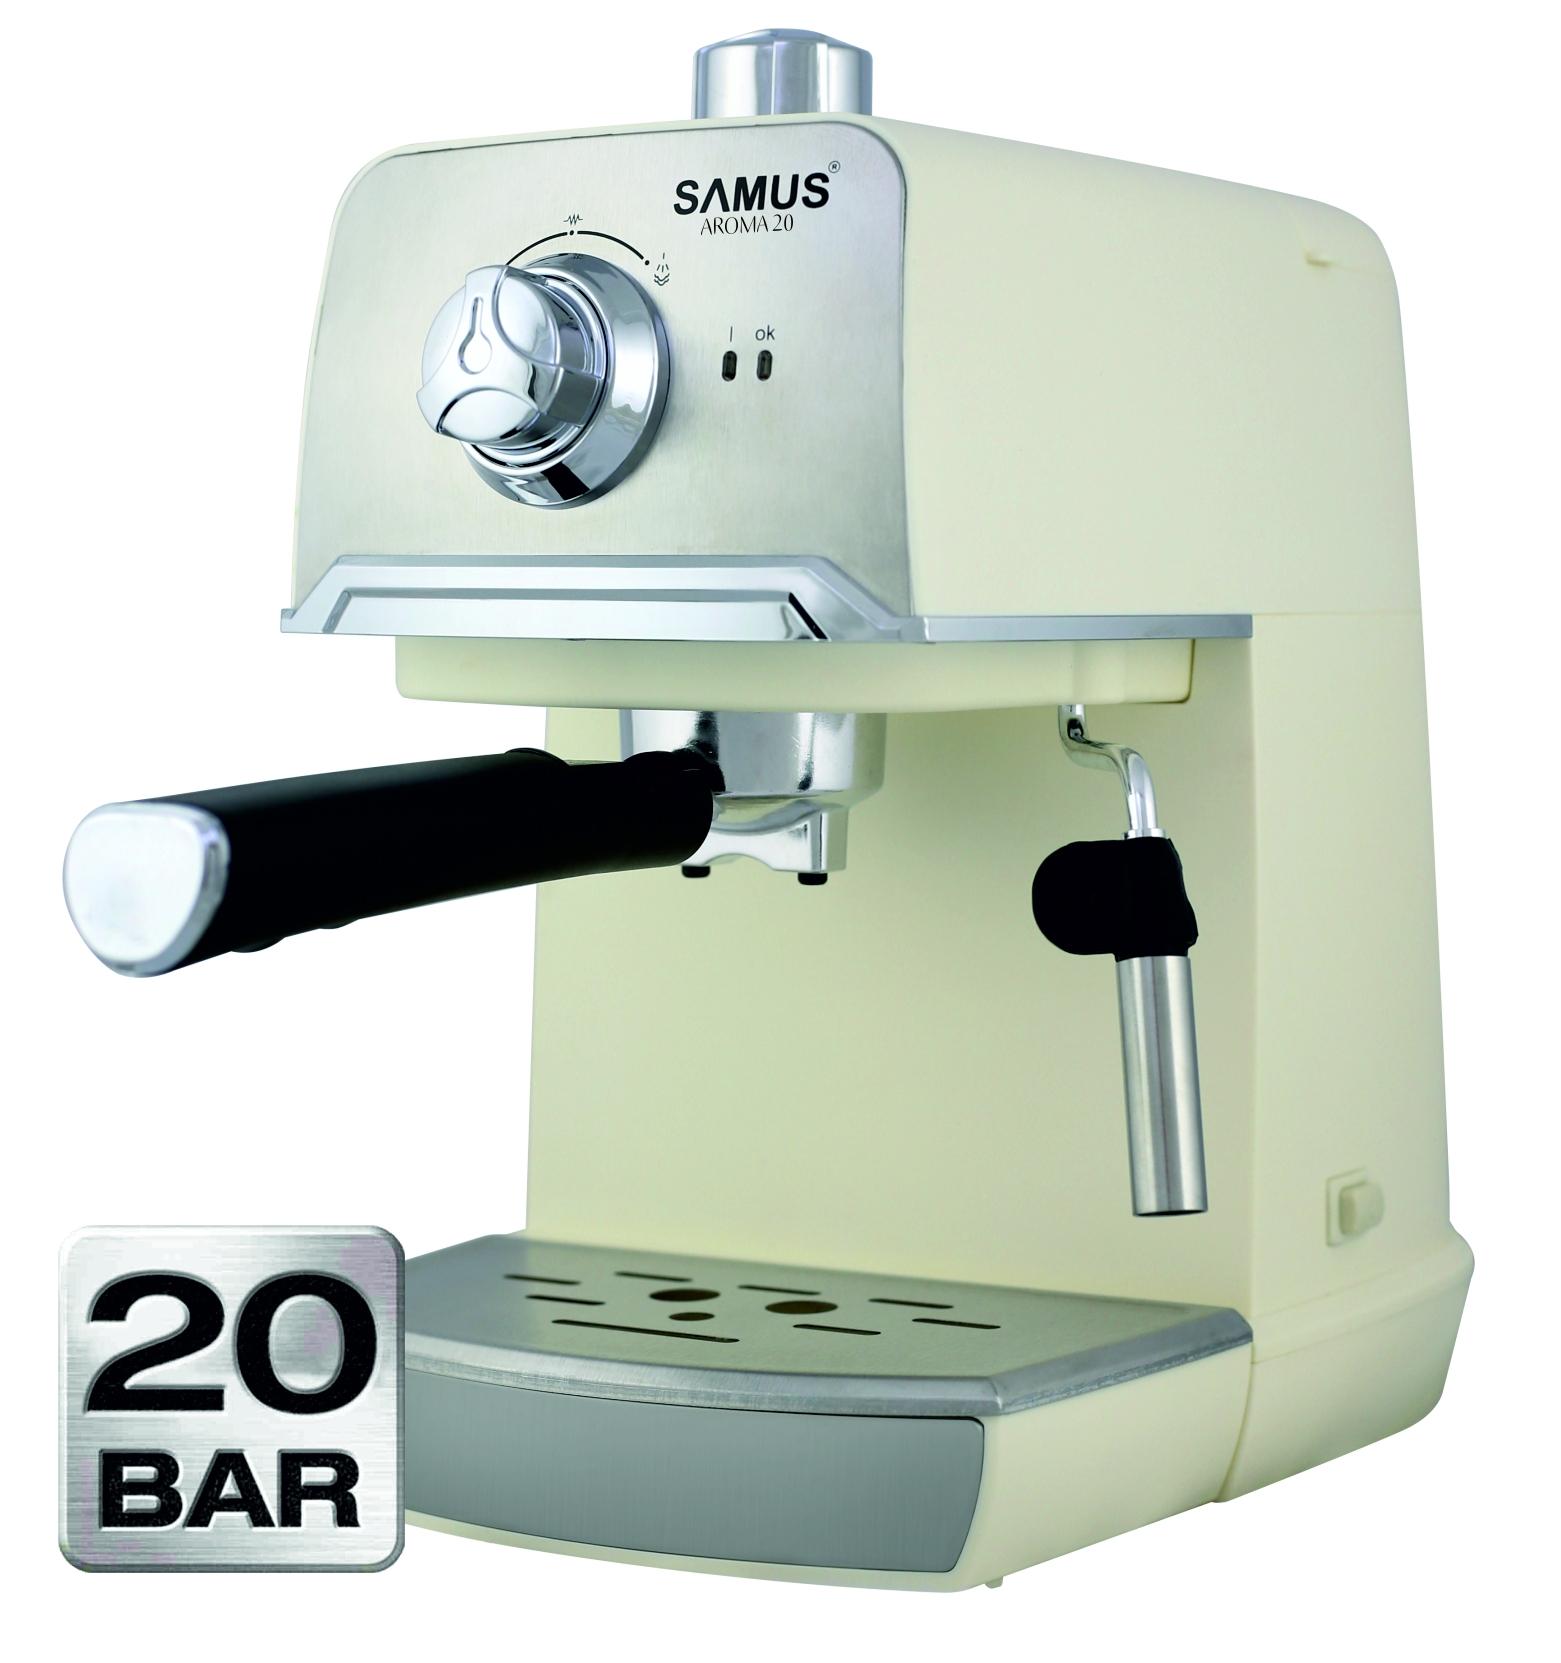 Espressor Samus Aroma 20, 850 W, 20 Bar, 1.2 l, Alb